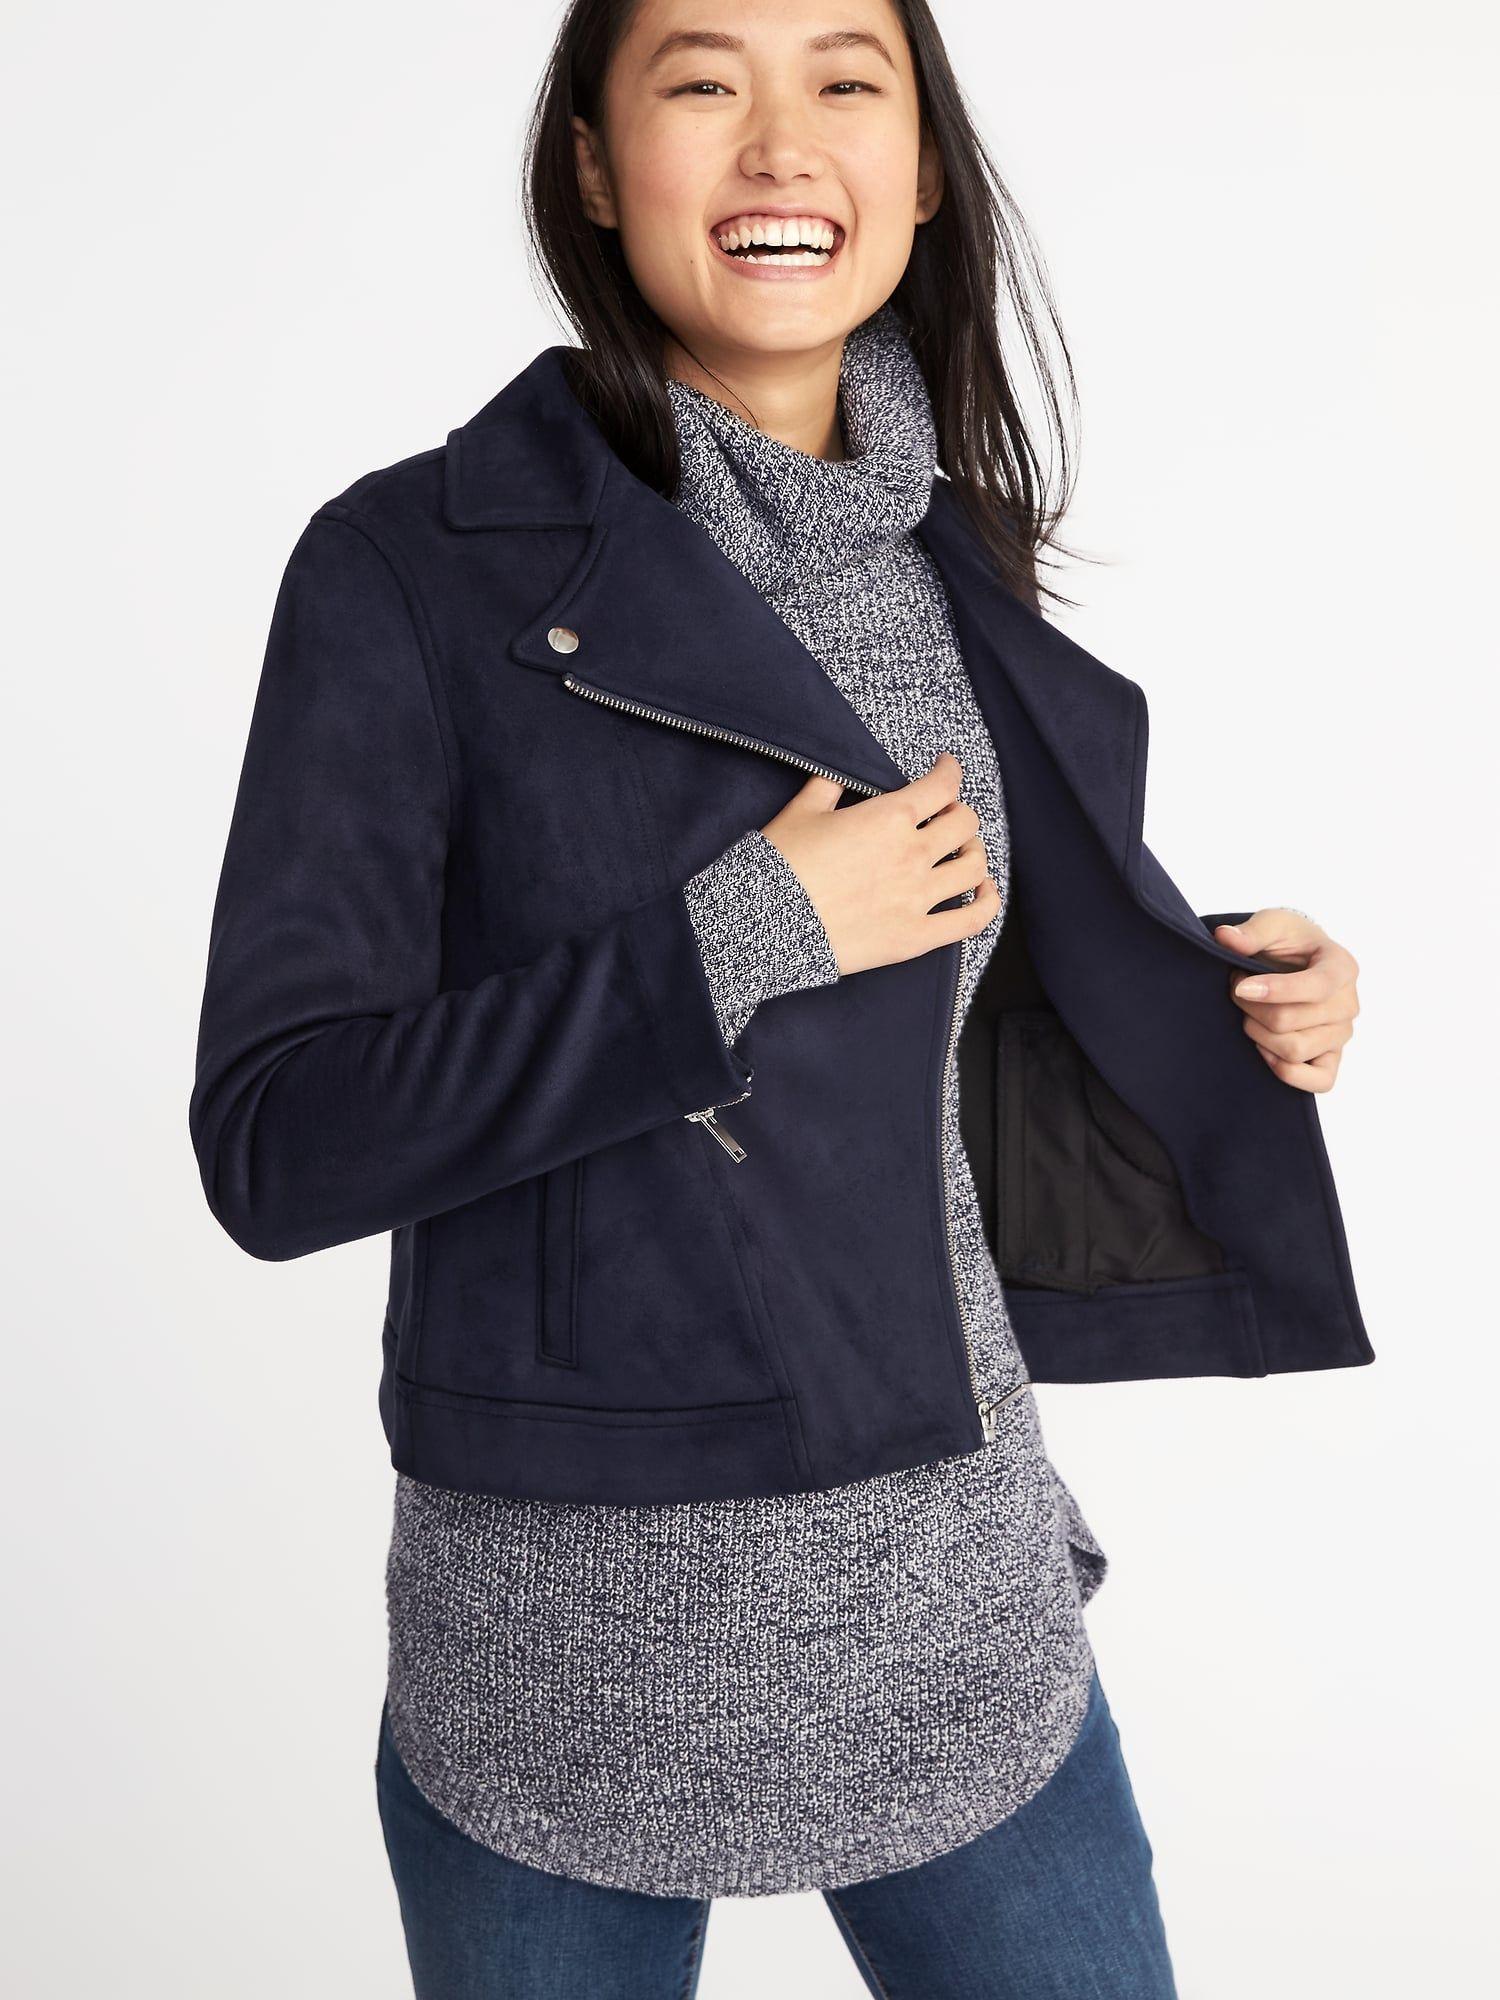 1750efa0ae Sueded-Knit Moto Jacket for Women in 2019